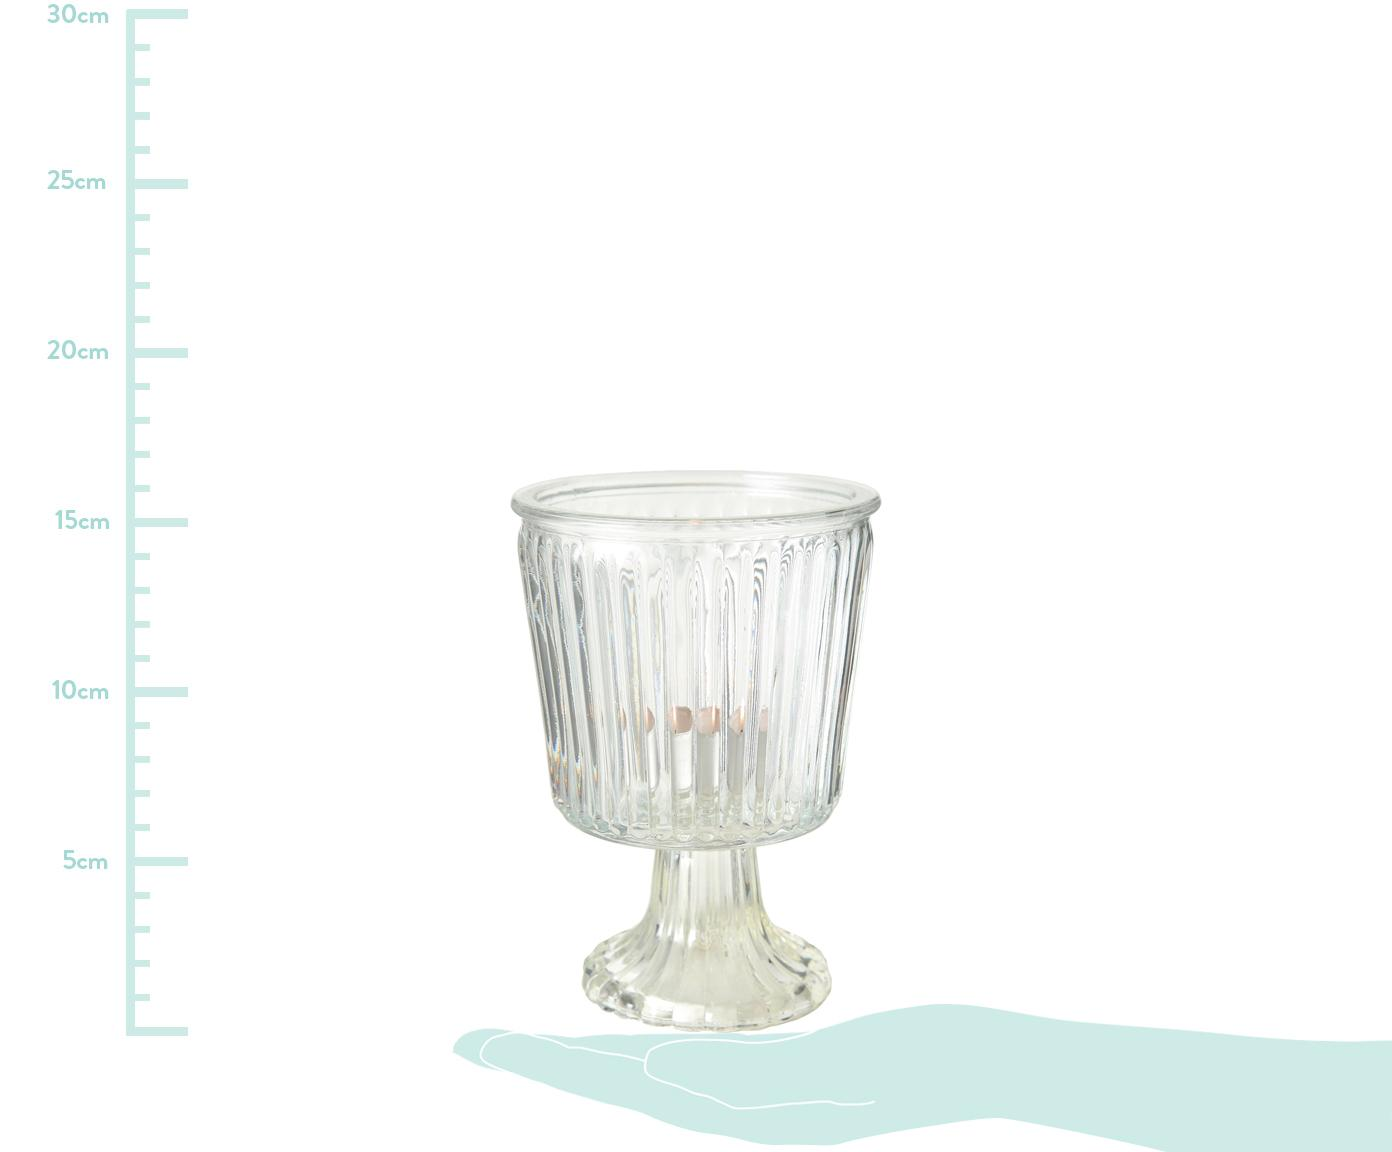 Teelichthalter-Set Romance, 2-tlg., Glas, Transparent, Ø 11 cm